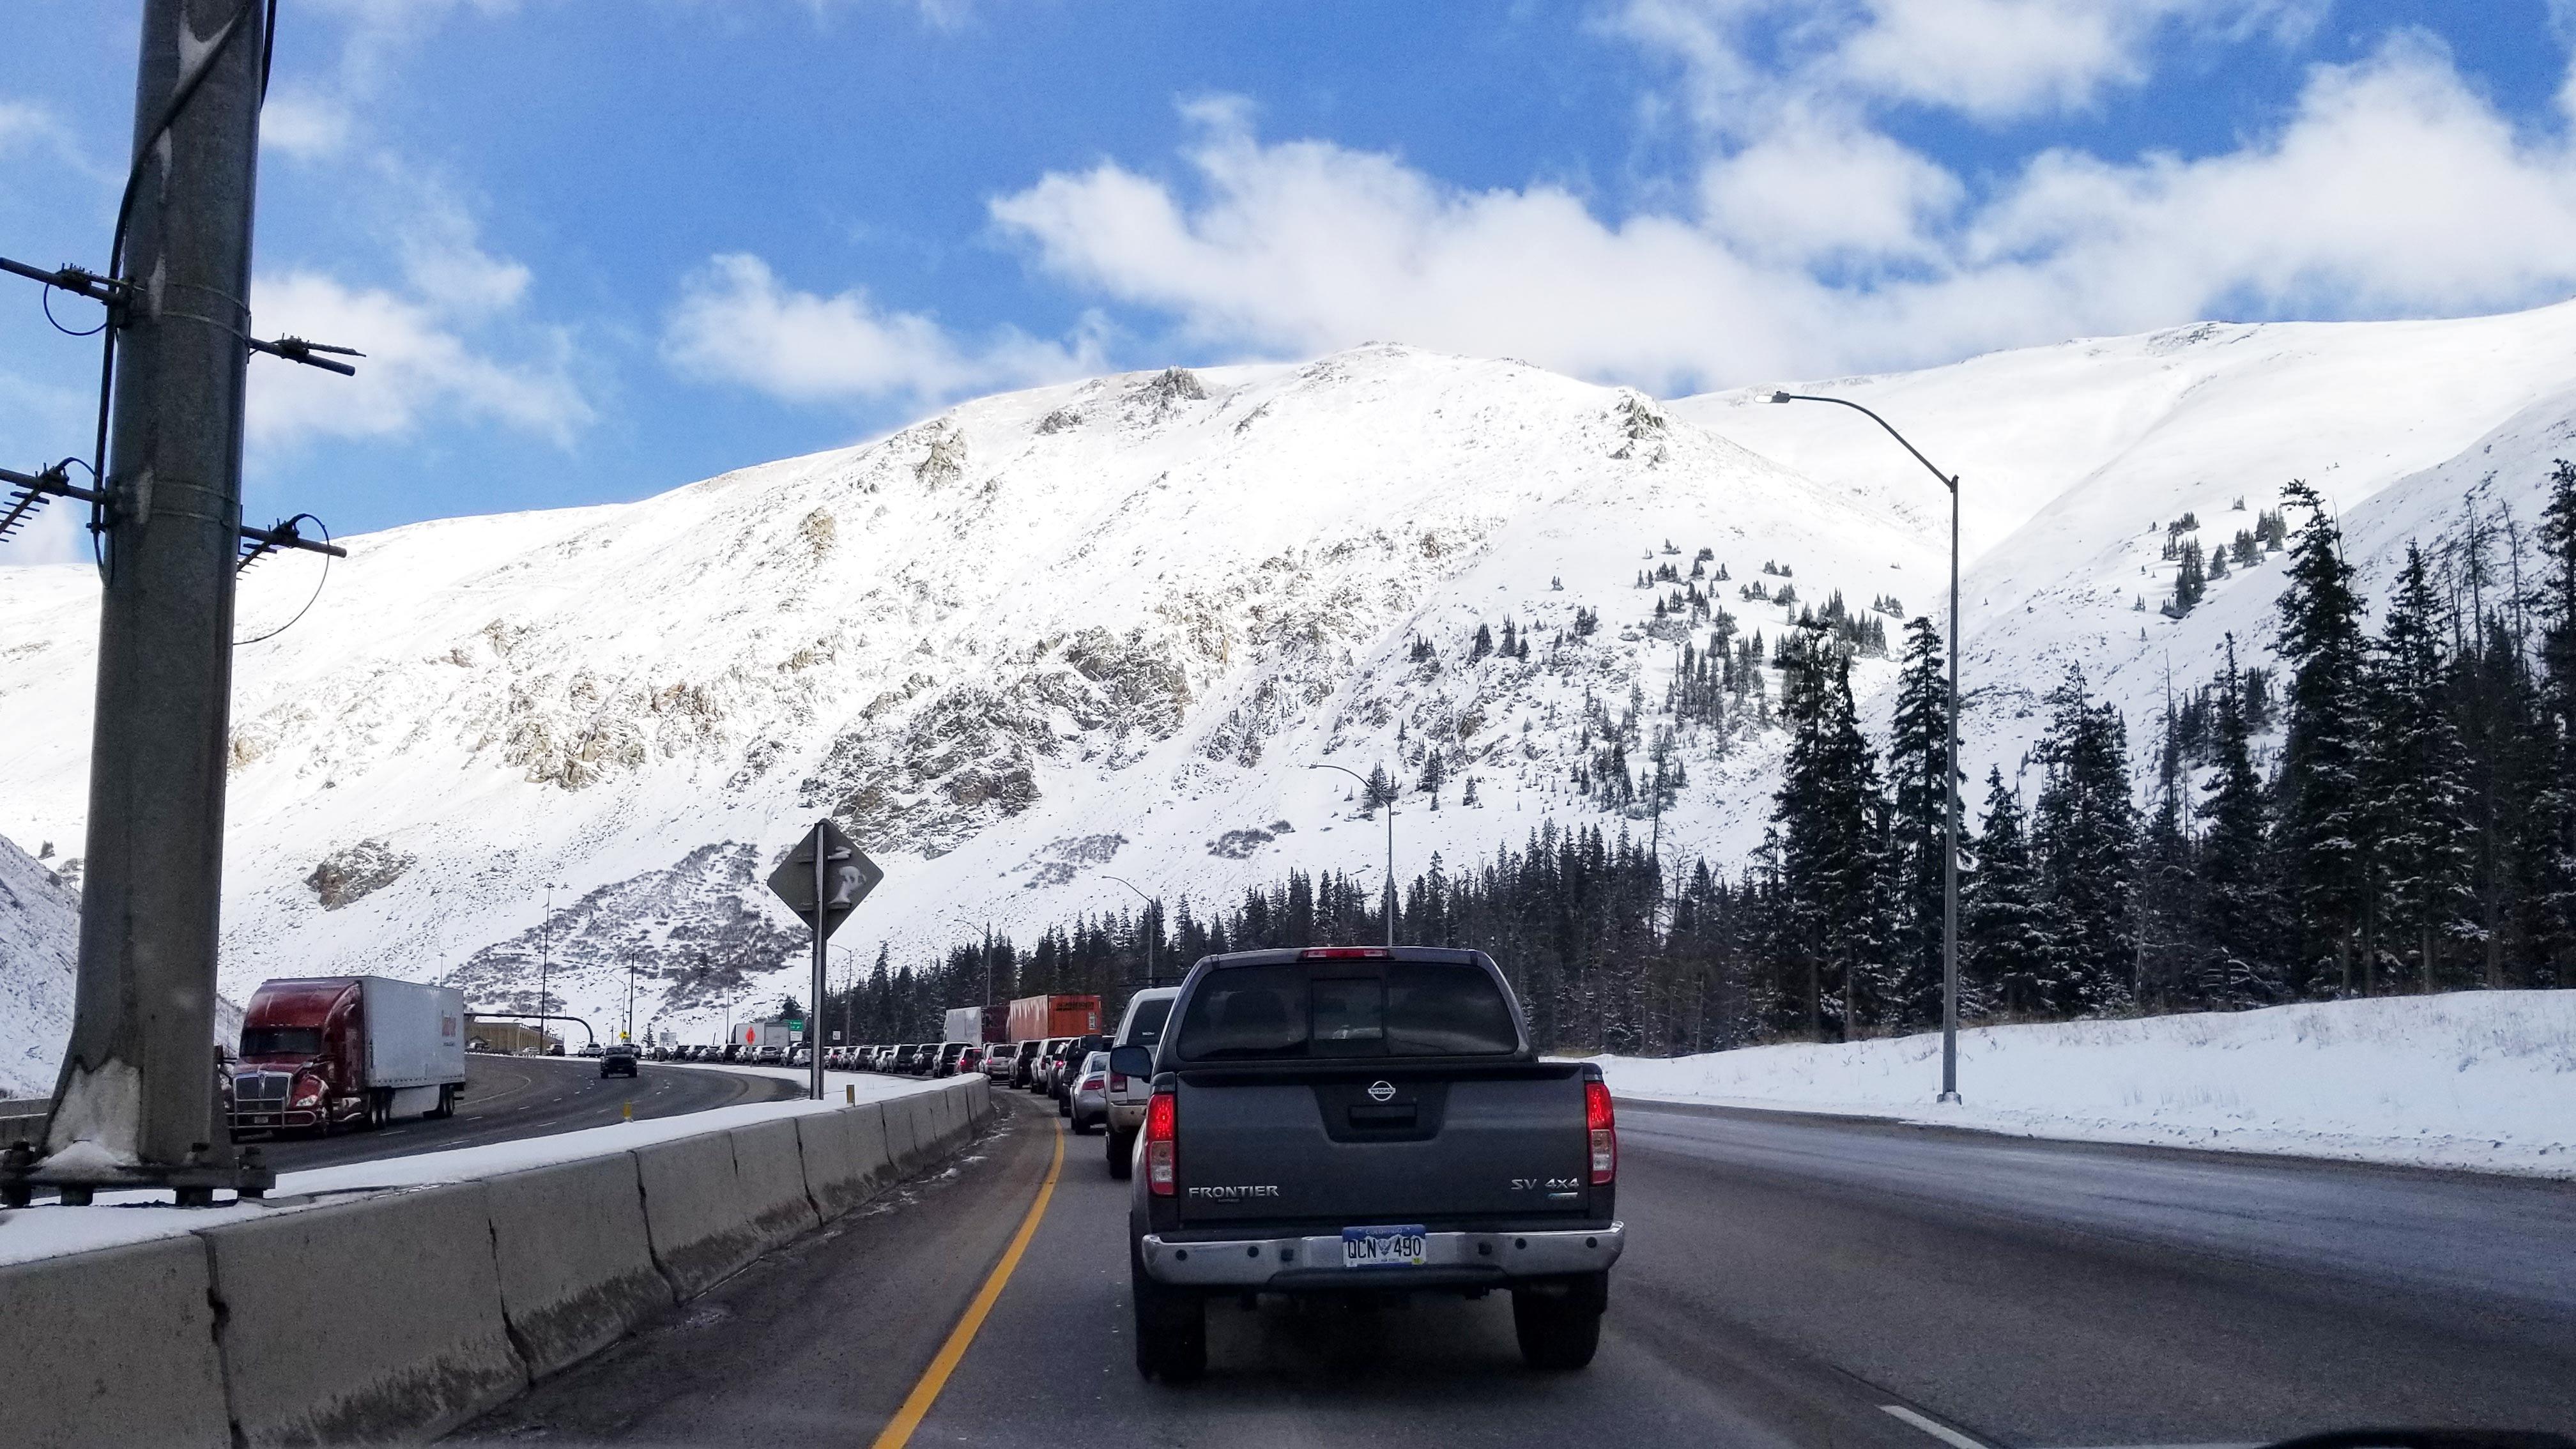 Colorado Road Conditions on the I-70 - SnowPak